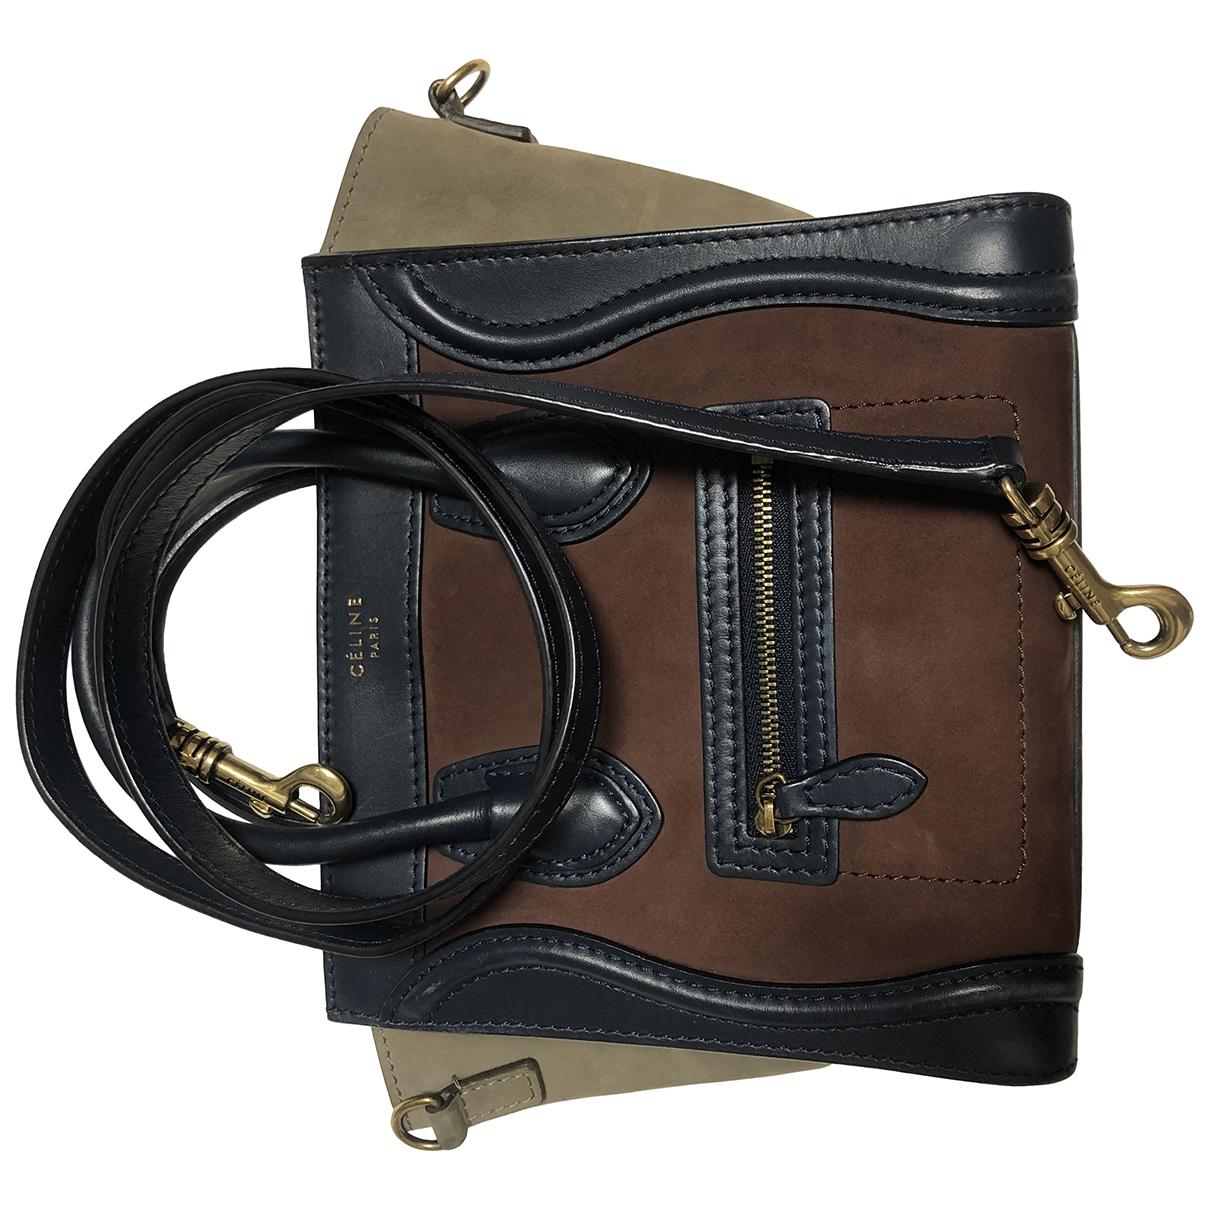 Celine Nano Luggage Handtasche in  Bunt Veloursleder